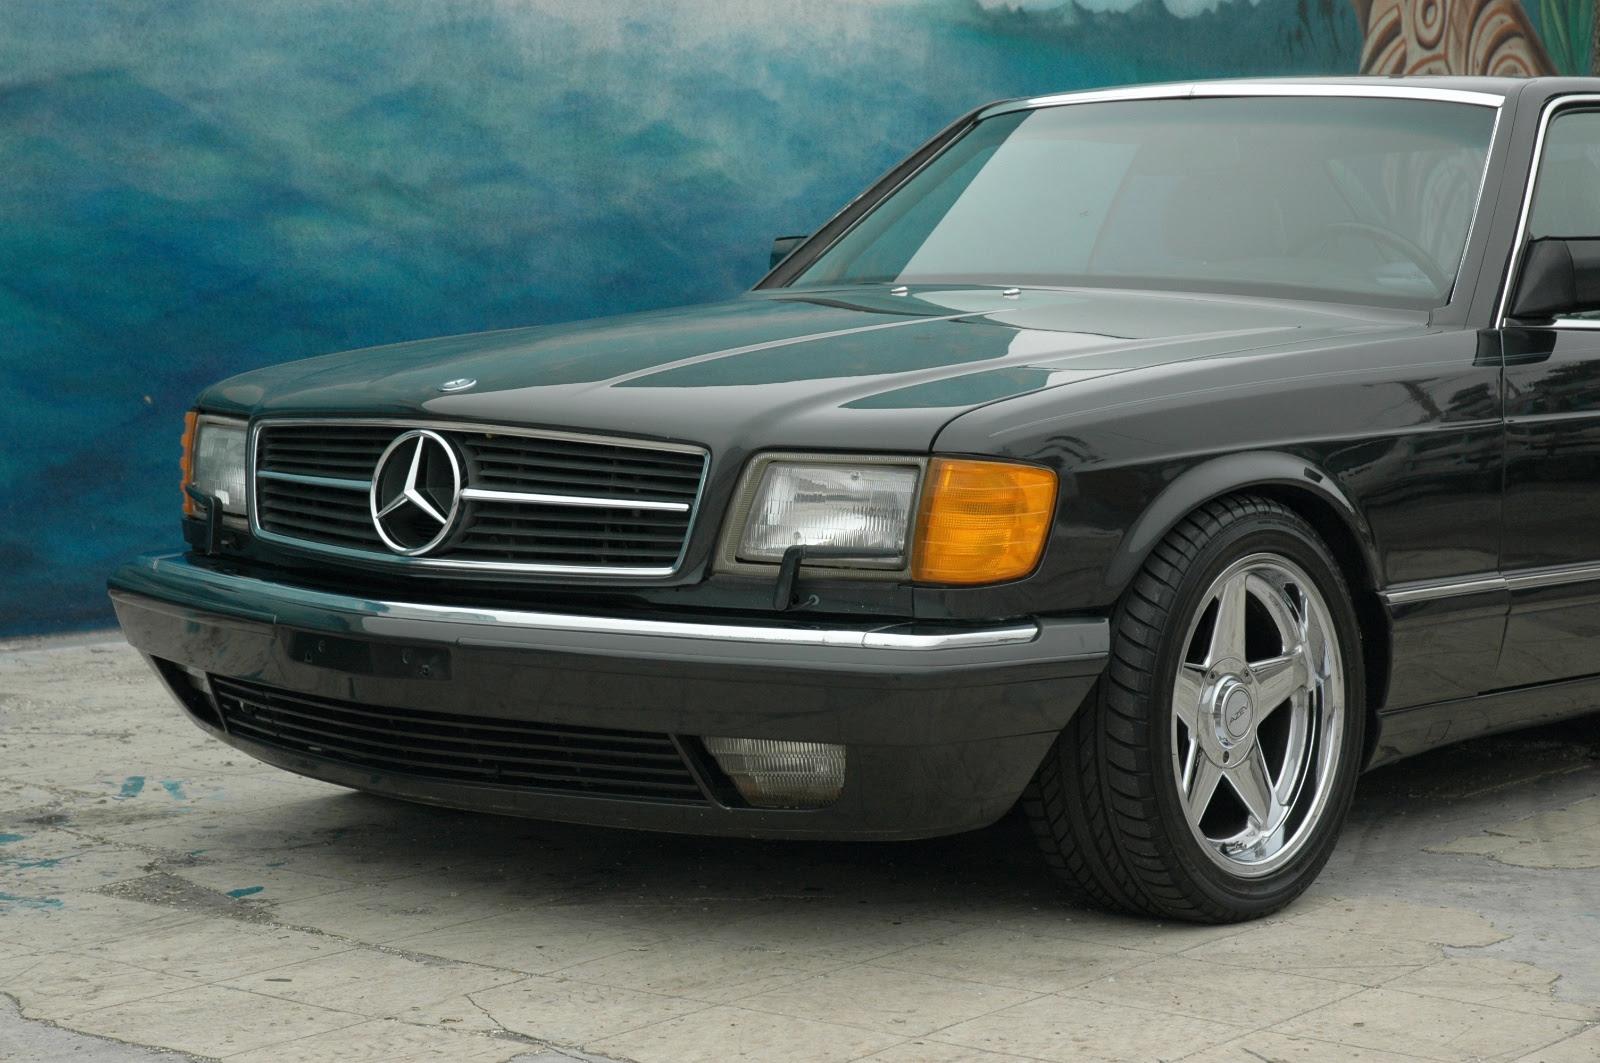 1990 Mercedes-Benz 560-Class - Pictures - CarGurus